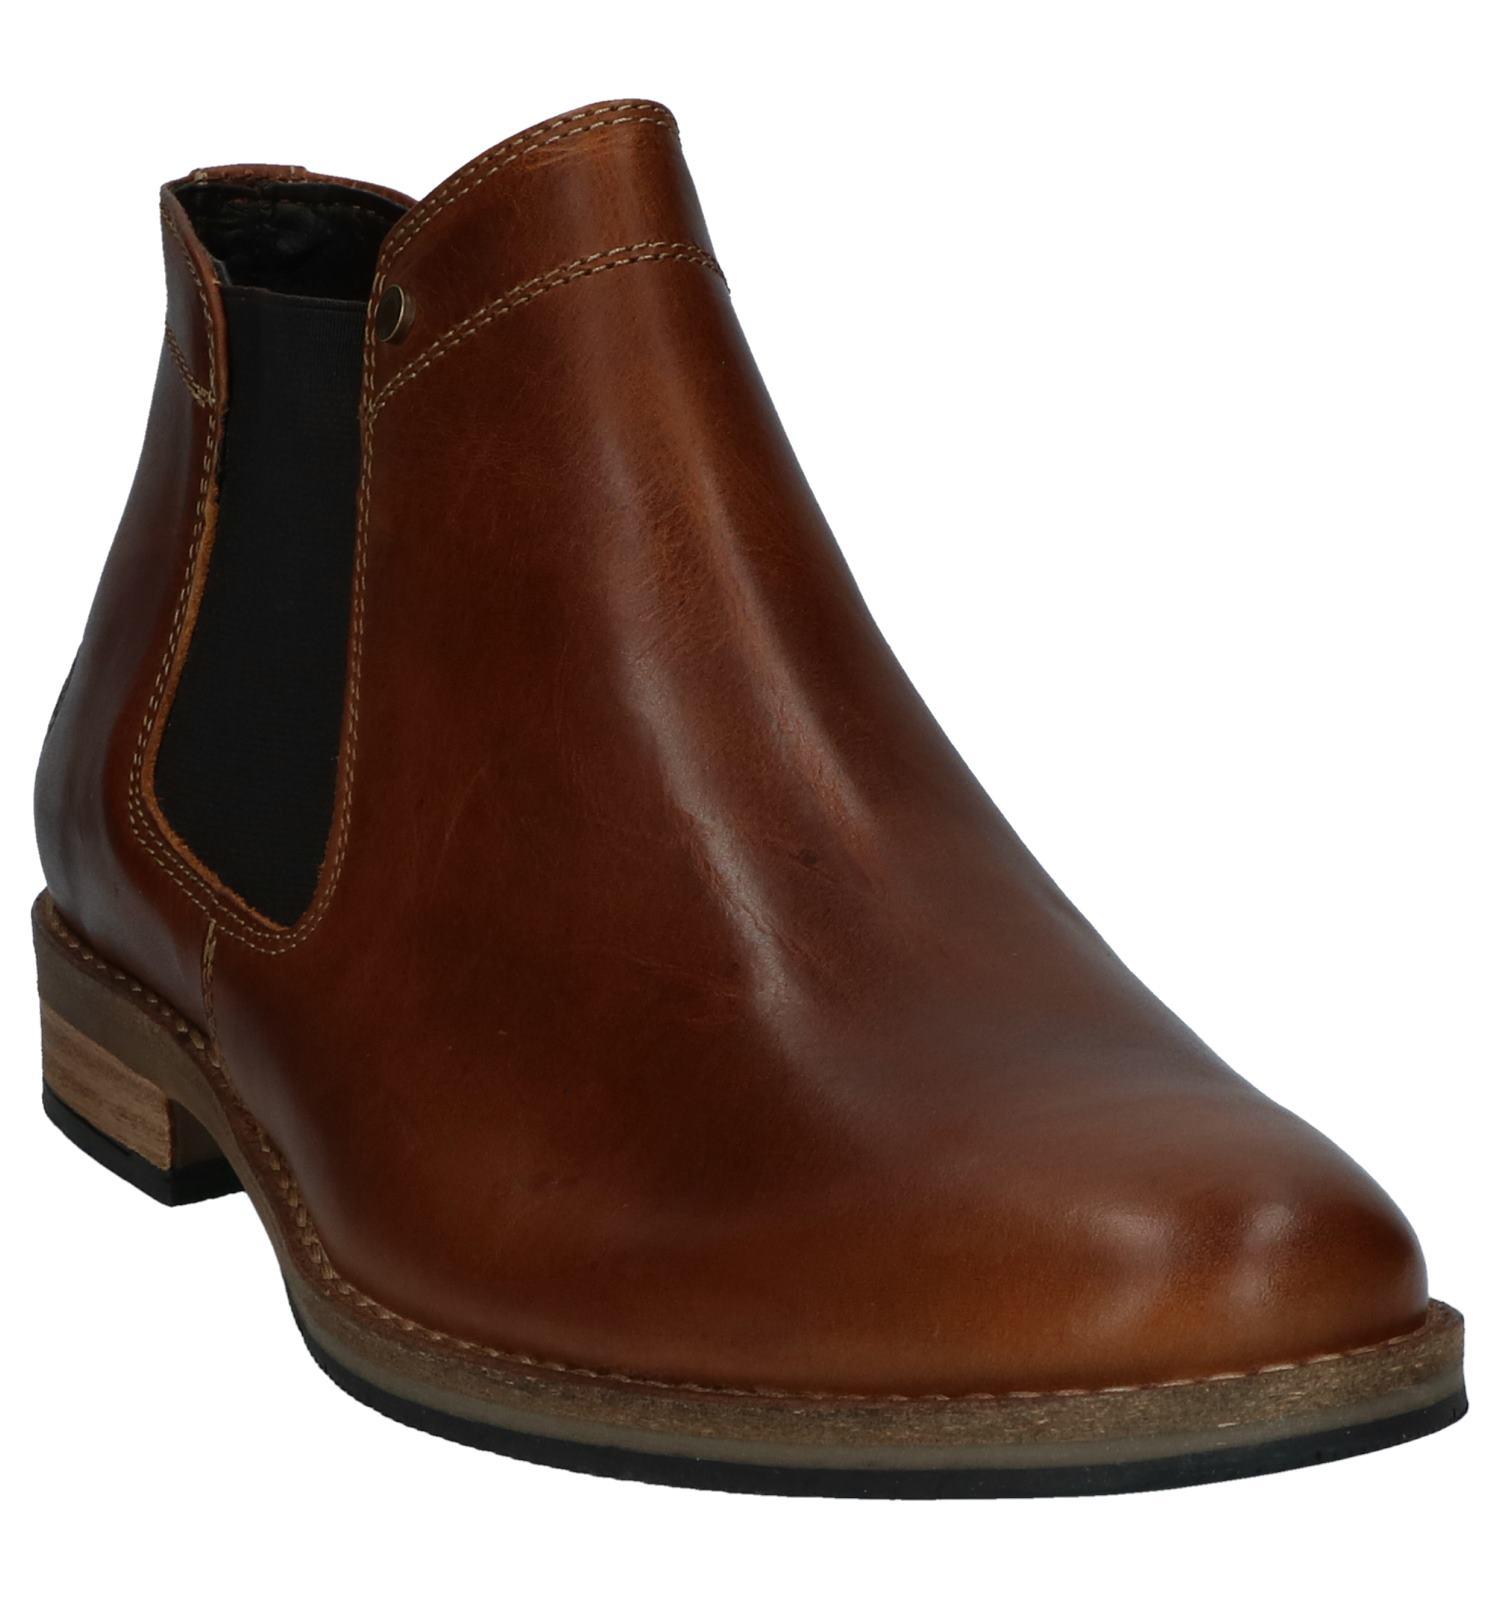 Cognac Boots Chelsea Boots Bullboxer Chelsea Chelsea Bullboxer Cognac Bullboxer Chelsea Boots Bullboxer Cognac Cognac uPXikZO